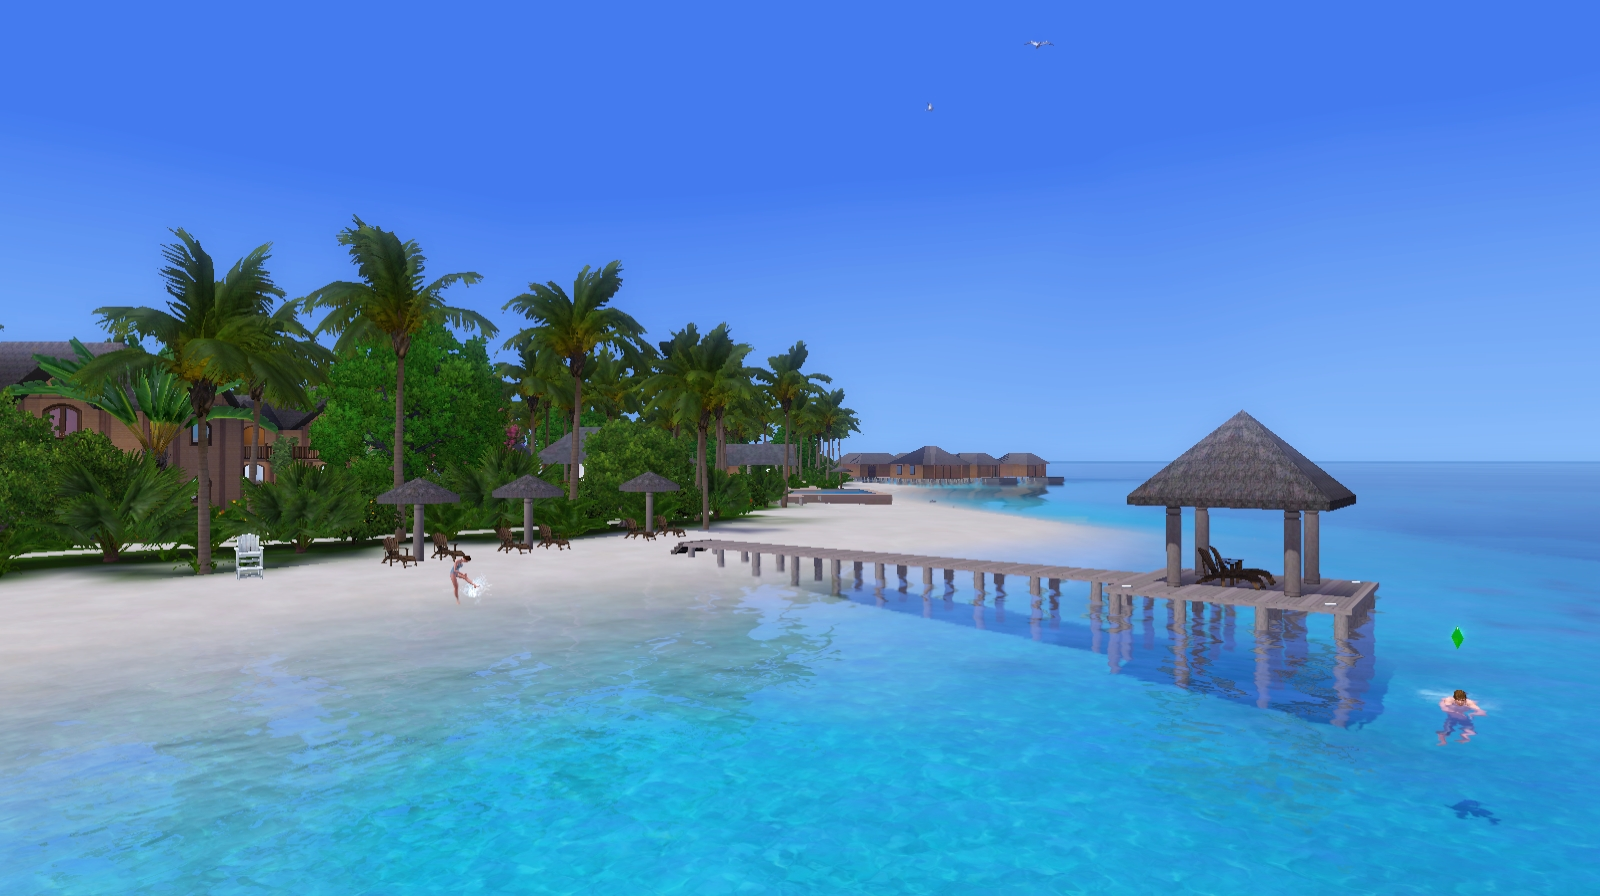 [Descarga] Mundo Suvadiva Resort, poblado. Screenshot-491